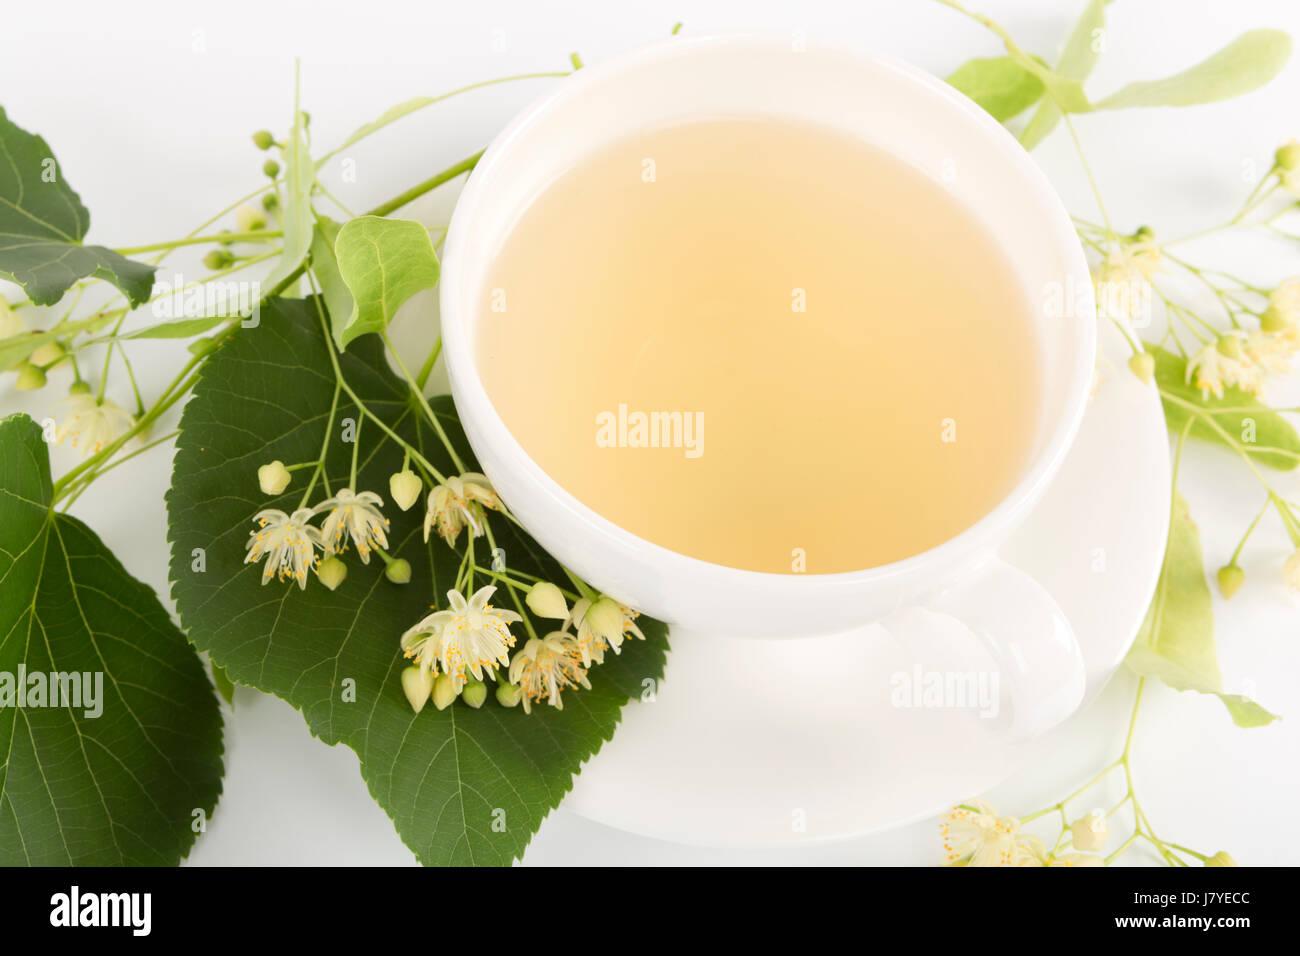 Studio shot of hot linden tea in a fine white porcelain cup on a wooden tabletop. Large-leaved Linden, Tilia platyphyllos. Stock Photo